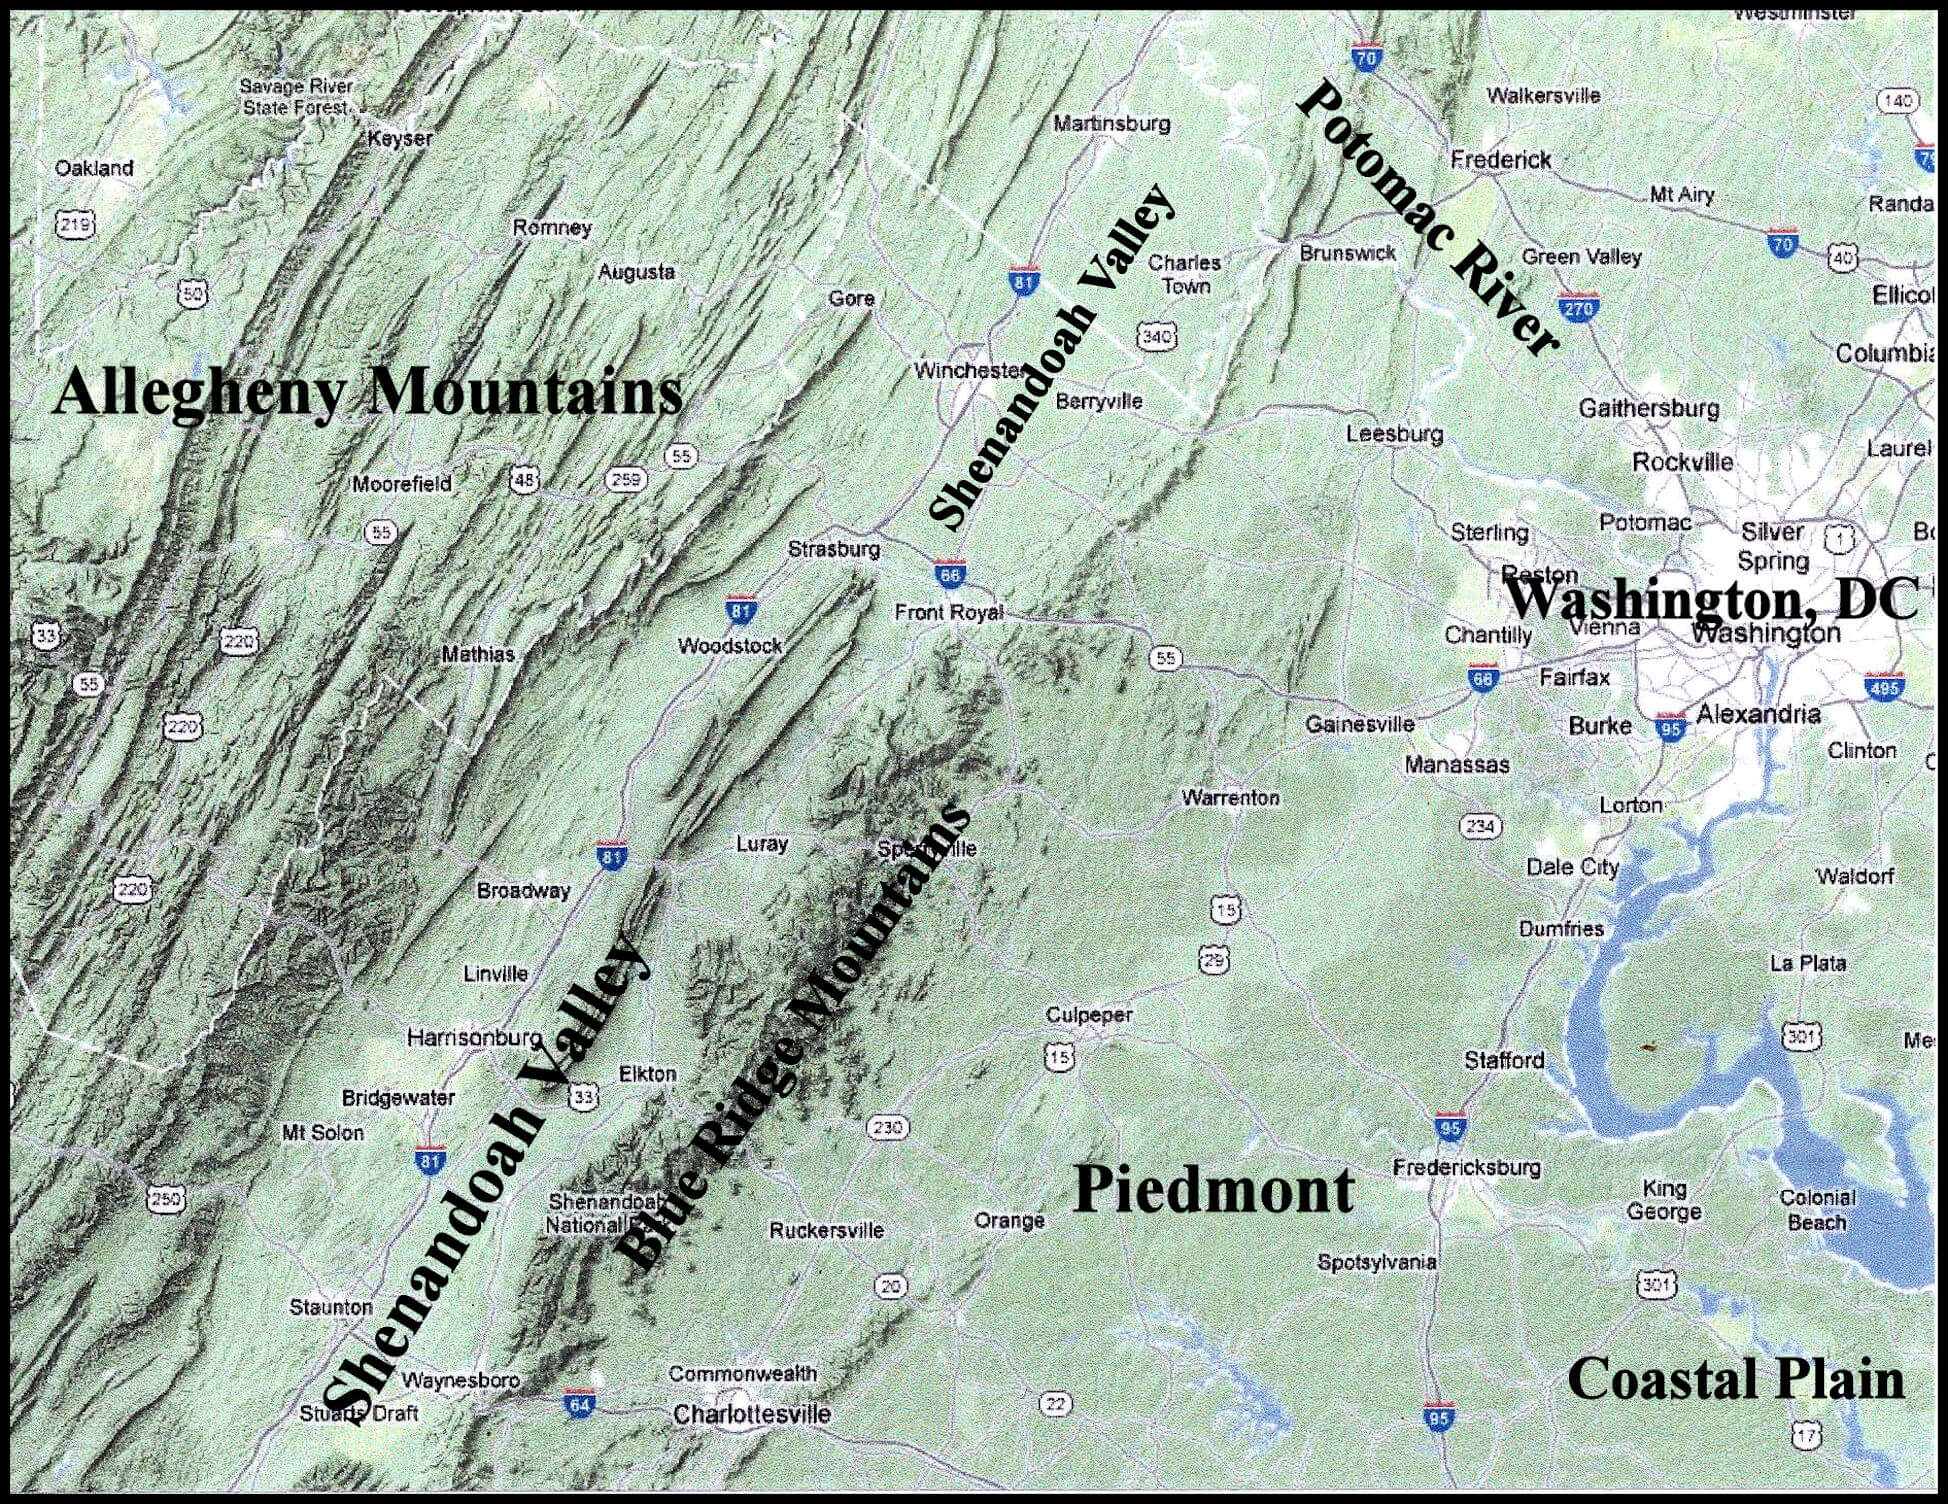 the fort loudon skeletons | access genealogy, Skeleton